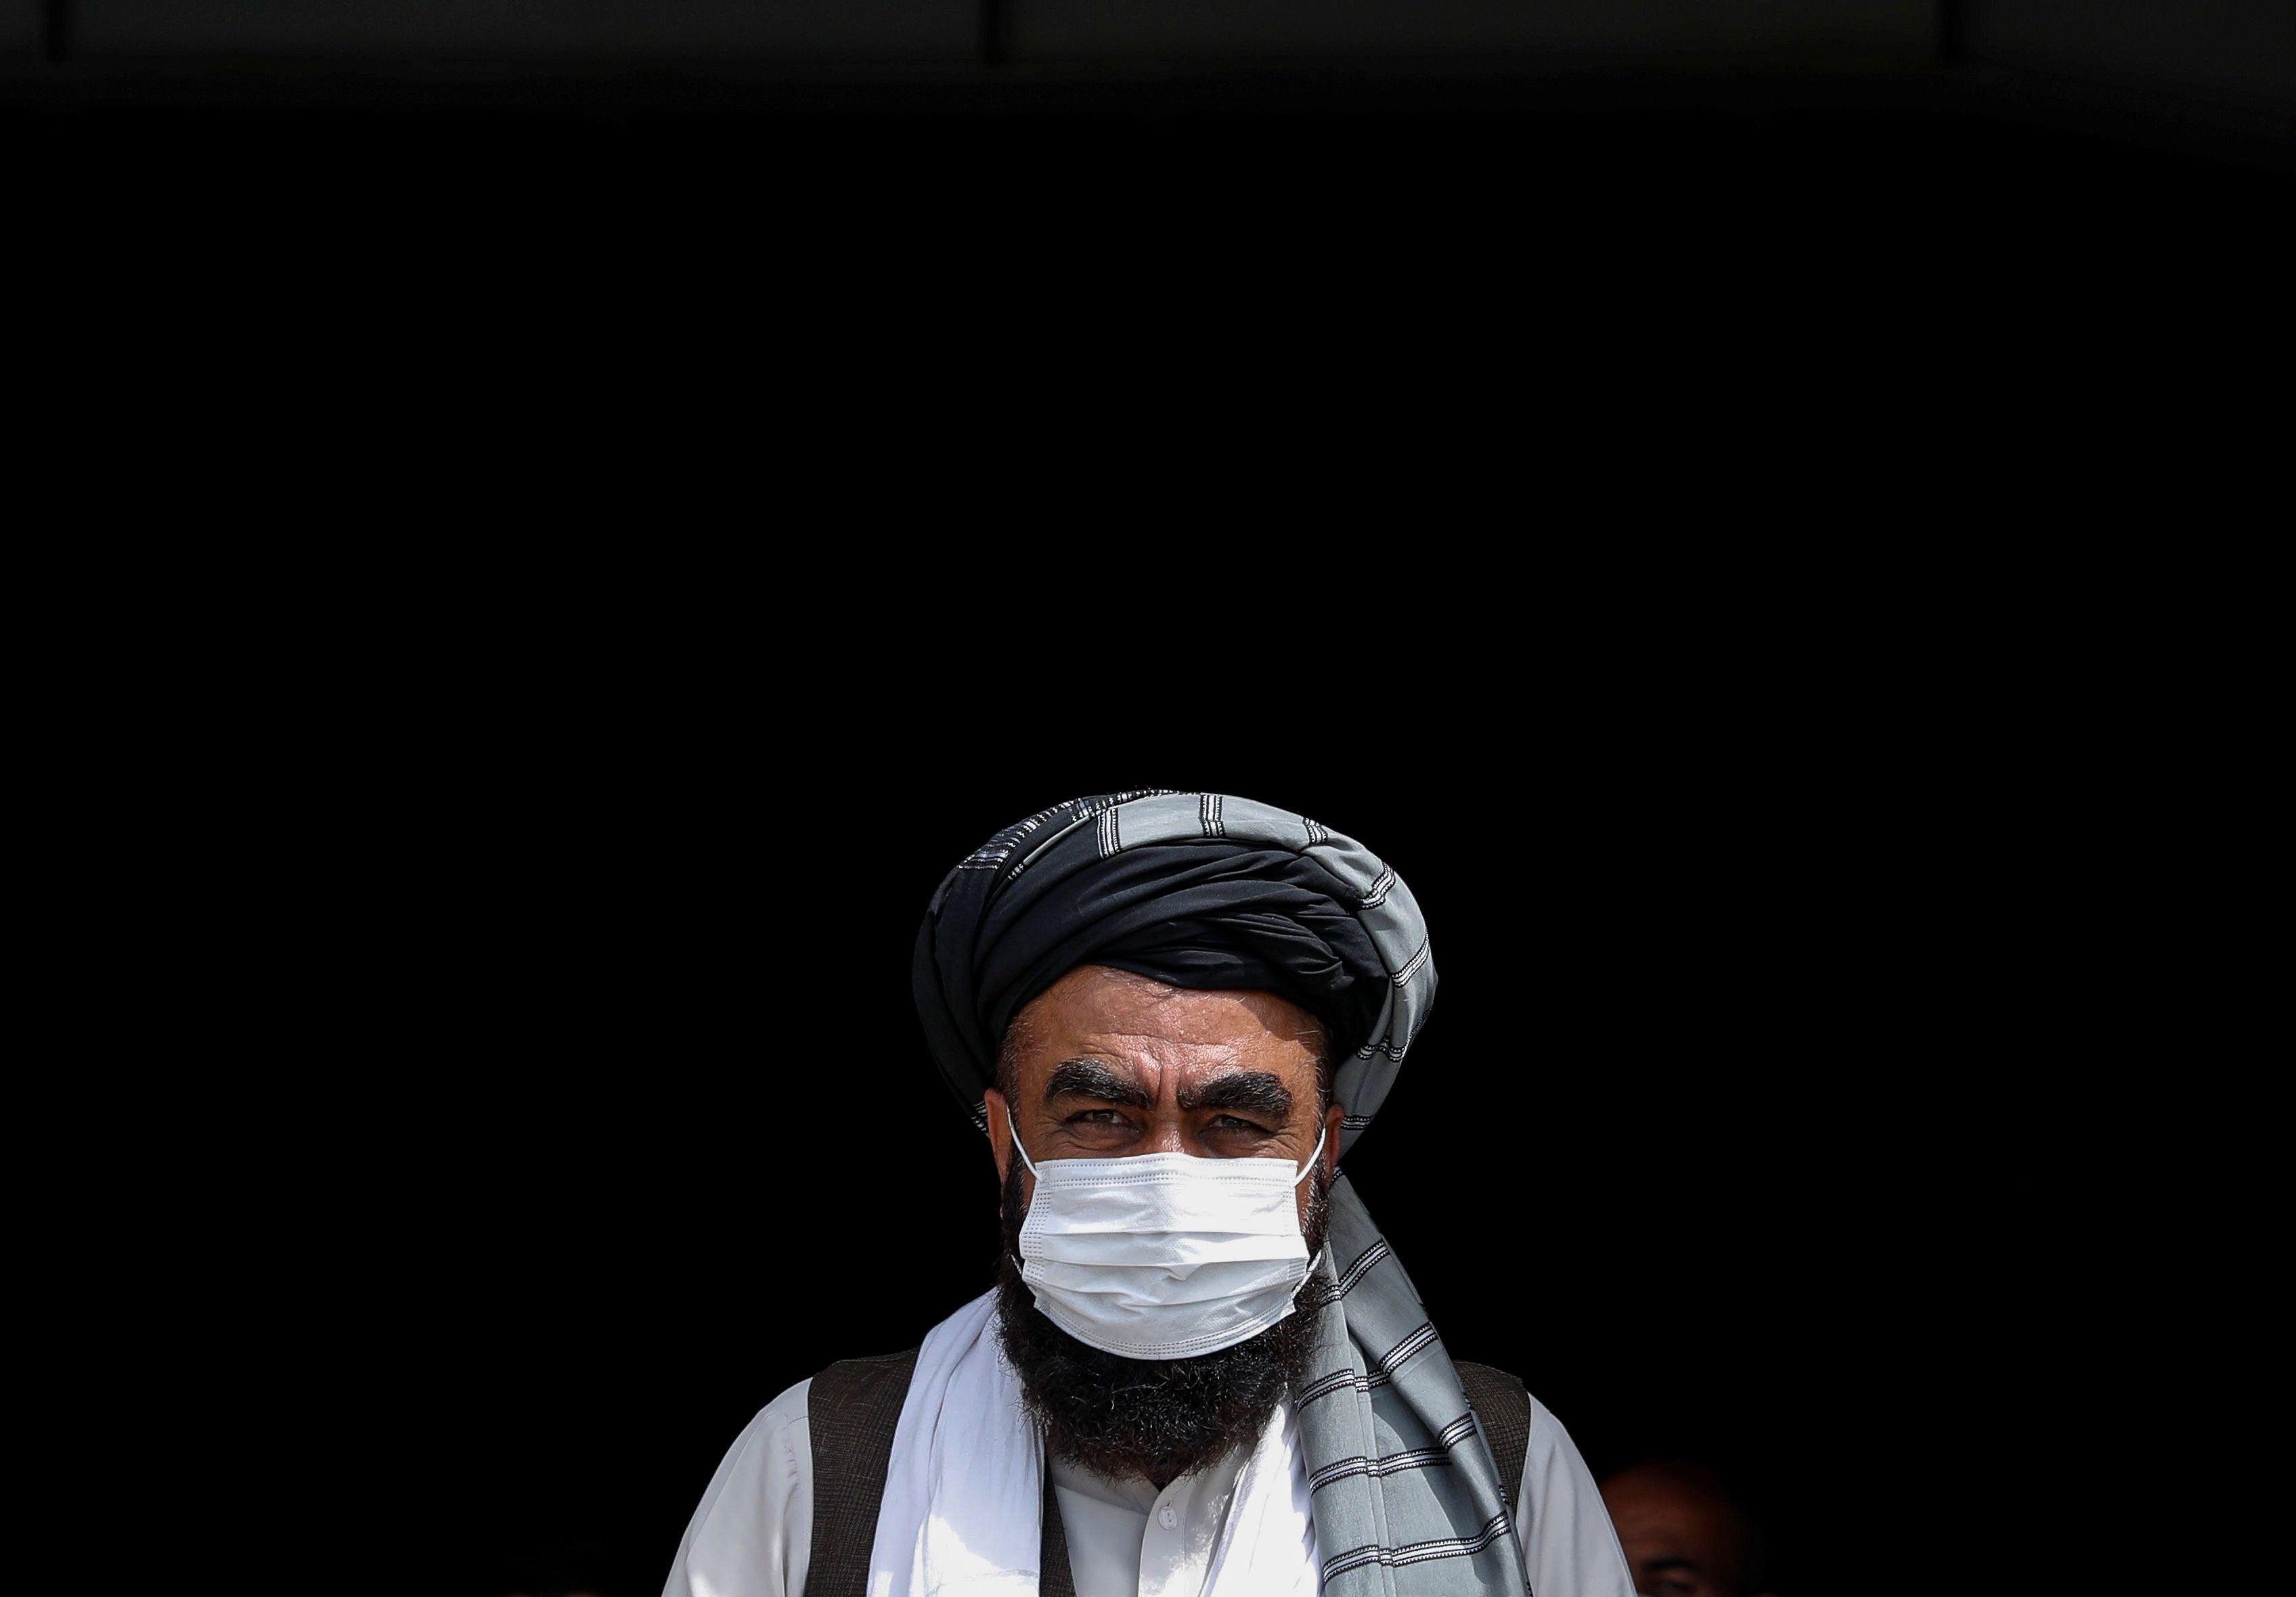 Coronavirus Politics Daily: Iran exports virus to Afghanistan, Beijing's crackdown in HK, Australia calls for global probe